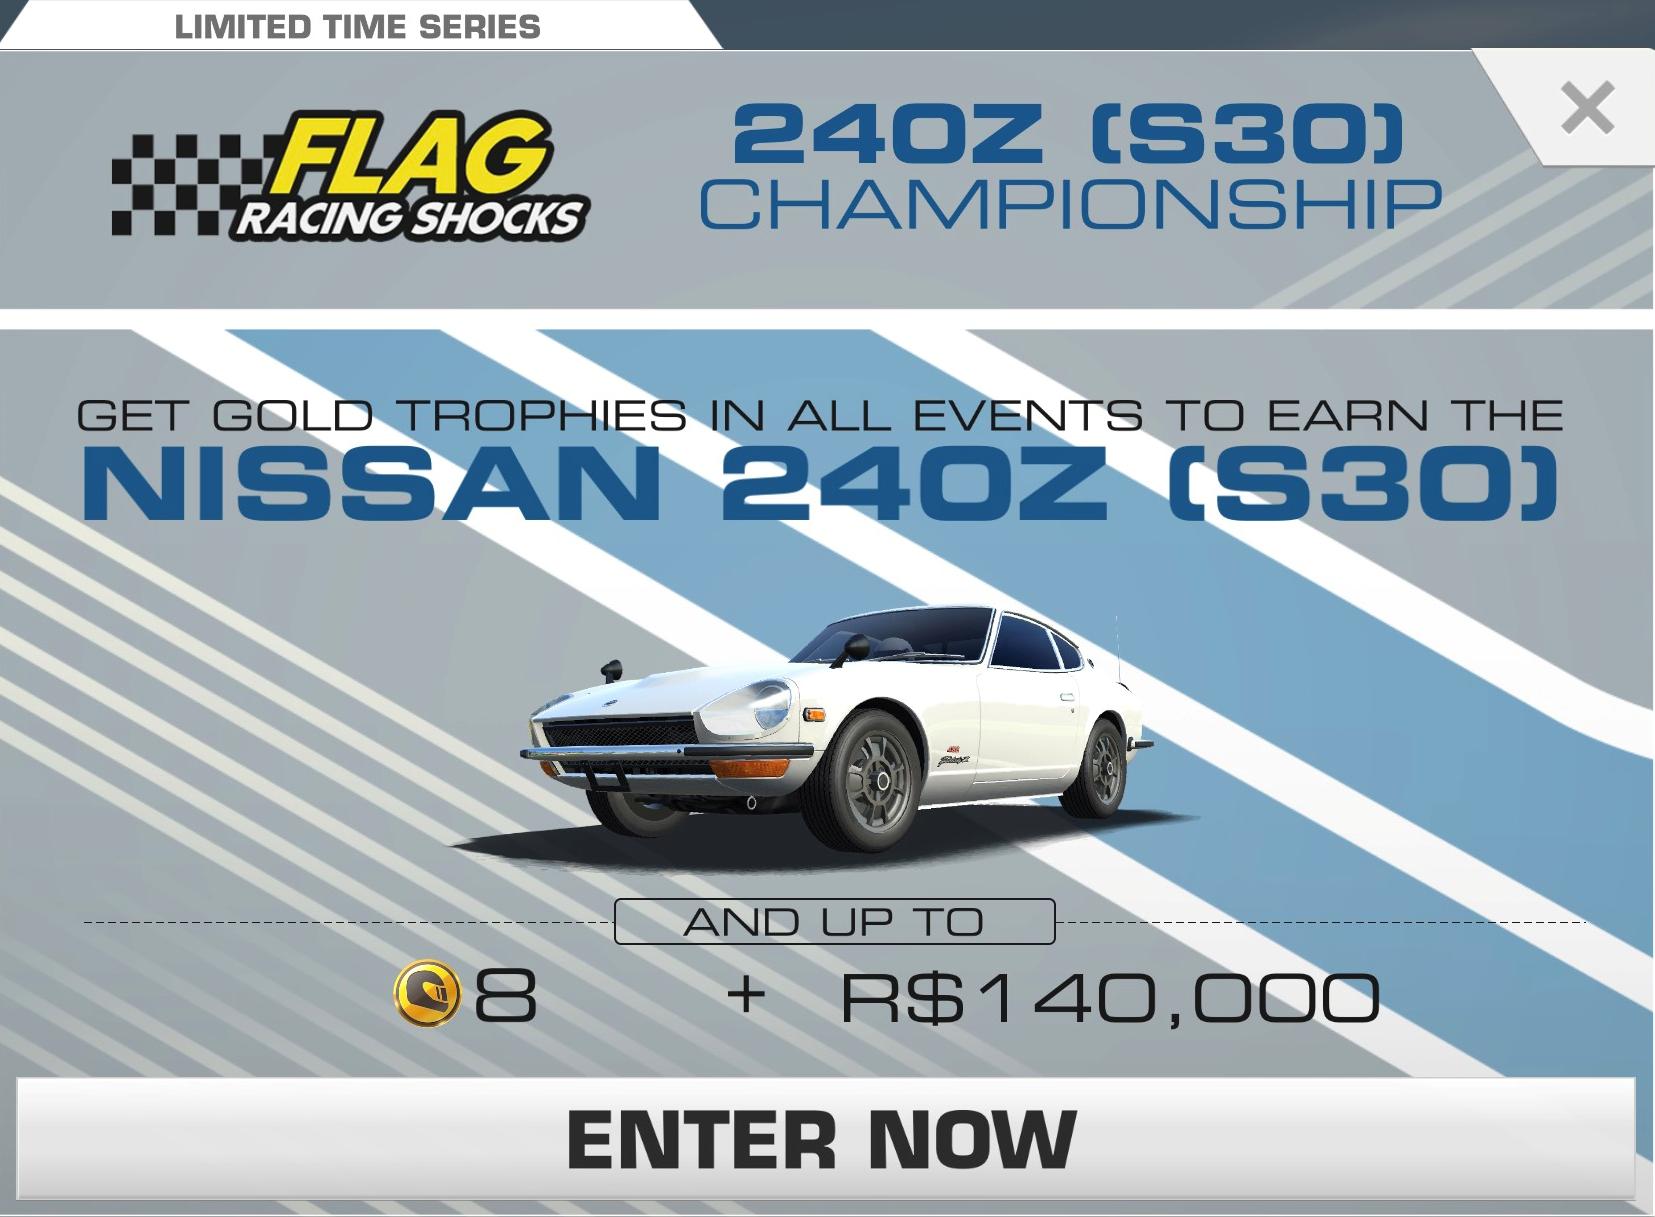 Nissan 240z s30 championship